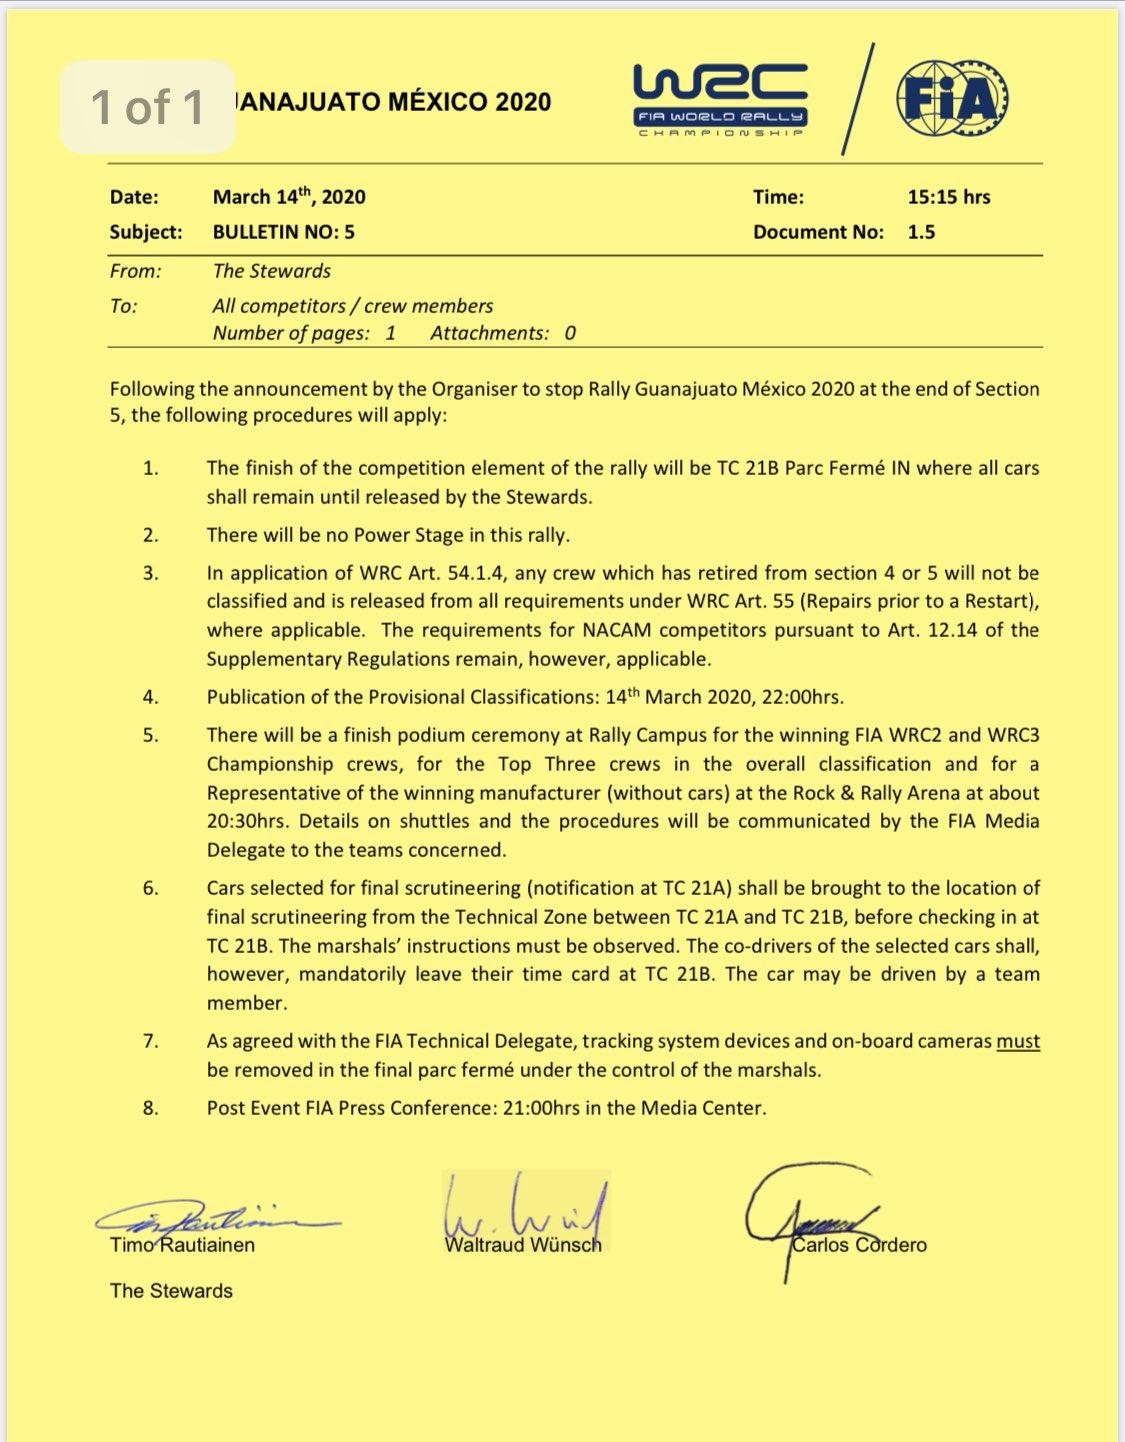 WRC: 17º Rallye Guanajuato Corona - México [12-15 Marzo] - Página 7 ETGjfm6XYAA7m3I?format=jpg&name=large